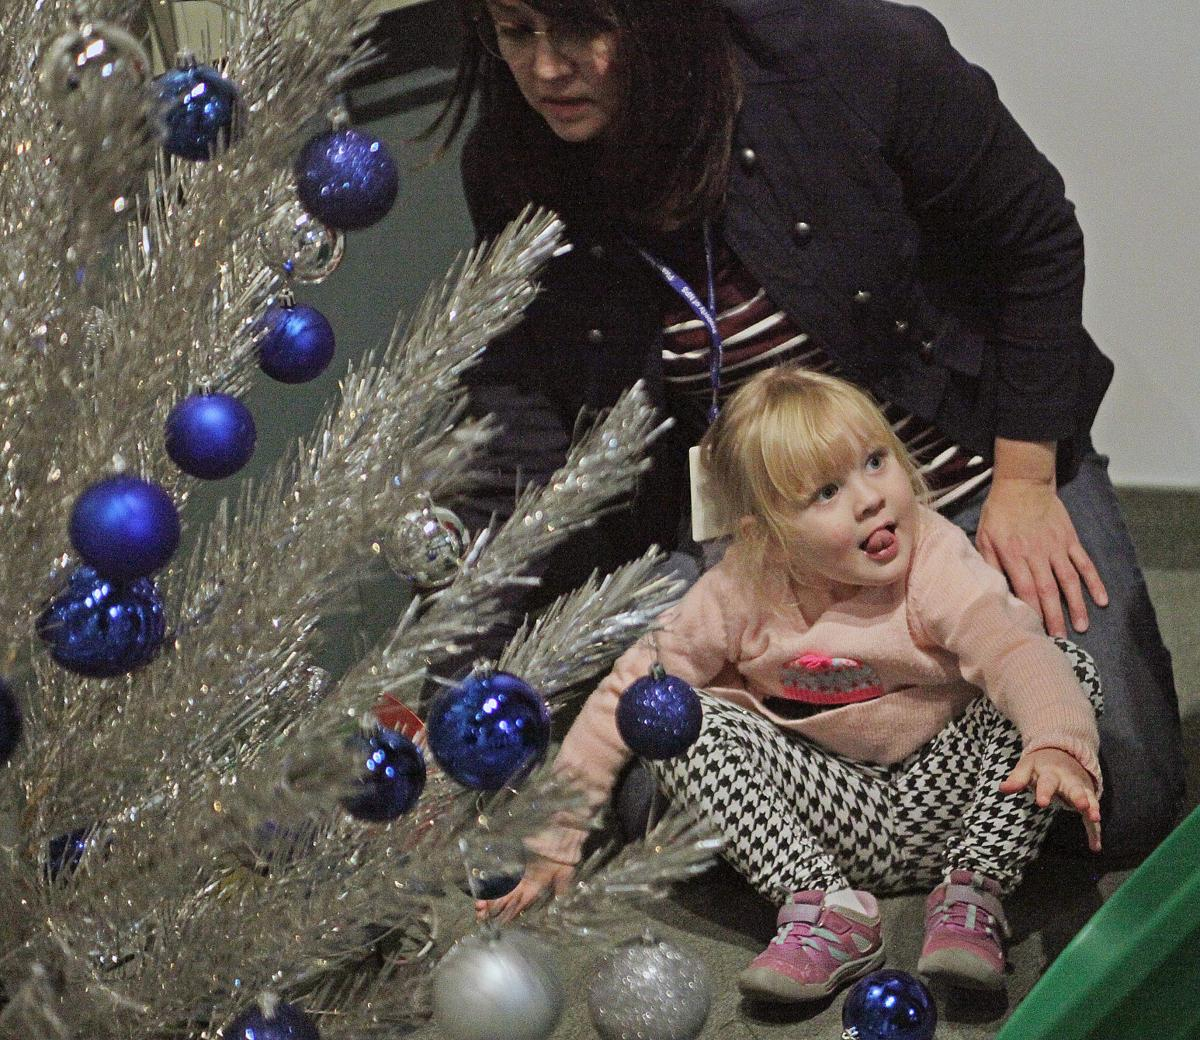 Vintage Artificial Christmas Trees.Vintage 1964 Artificial Christmas Tree To Spin For Cultural Heritage